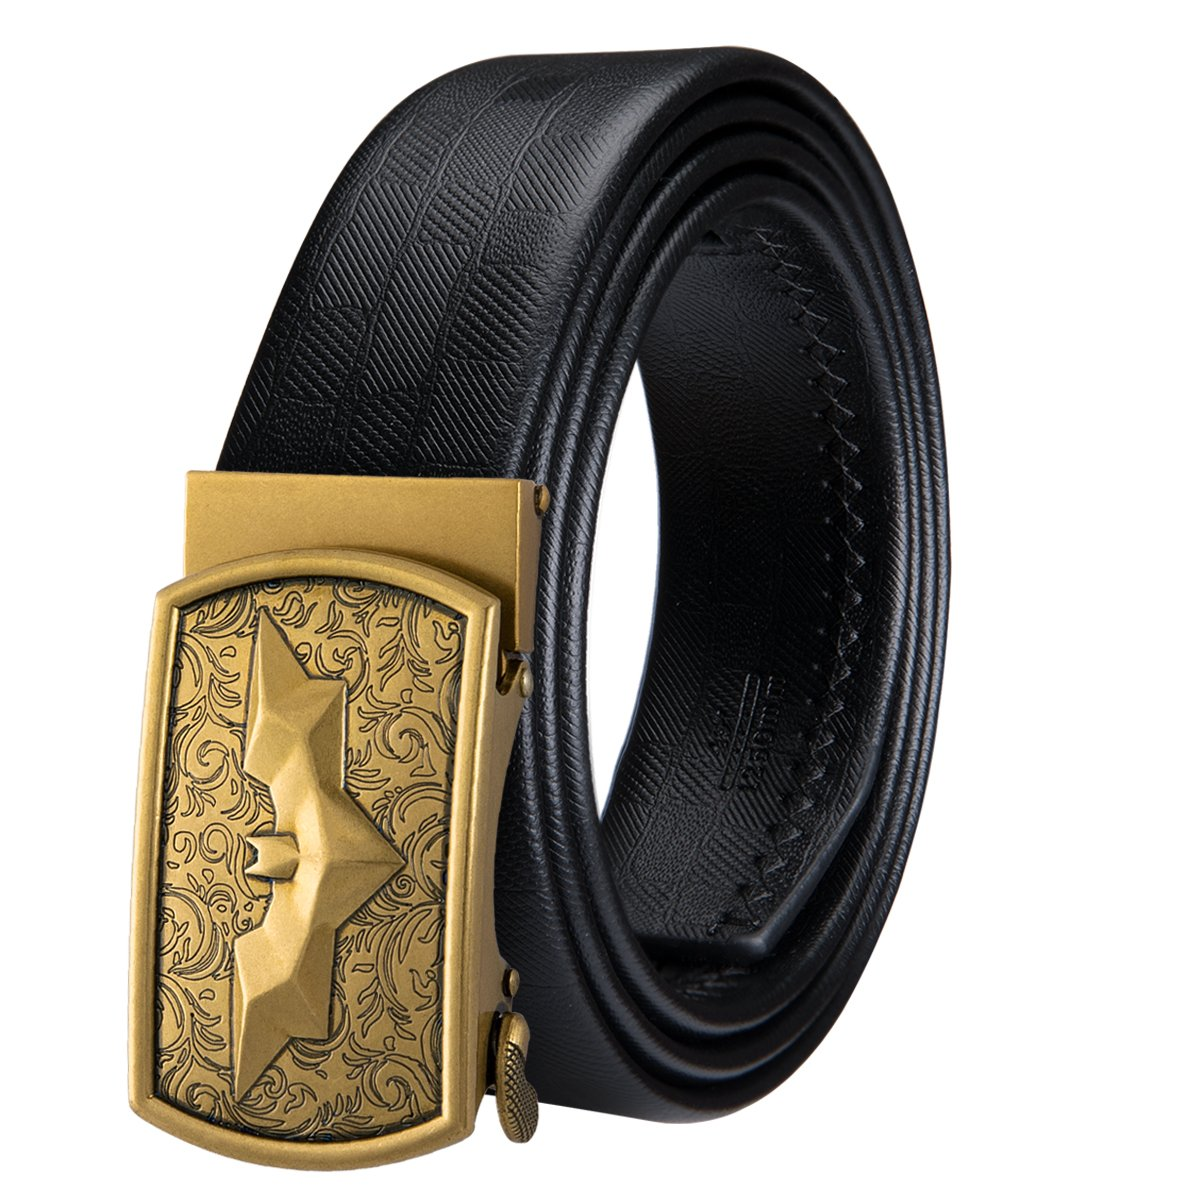 Dubulle Mens Italian Genuine Leather Belt with Removable Buckle Adjustable Automatic Buckle Belt Black Ratchet Belt for Men (DK-1004, waist size 42'' to 47'', belt 55''(140cm))